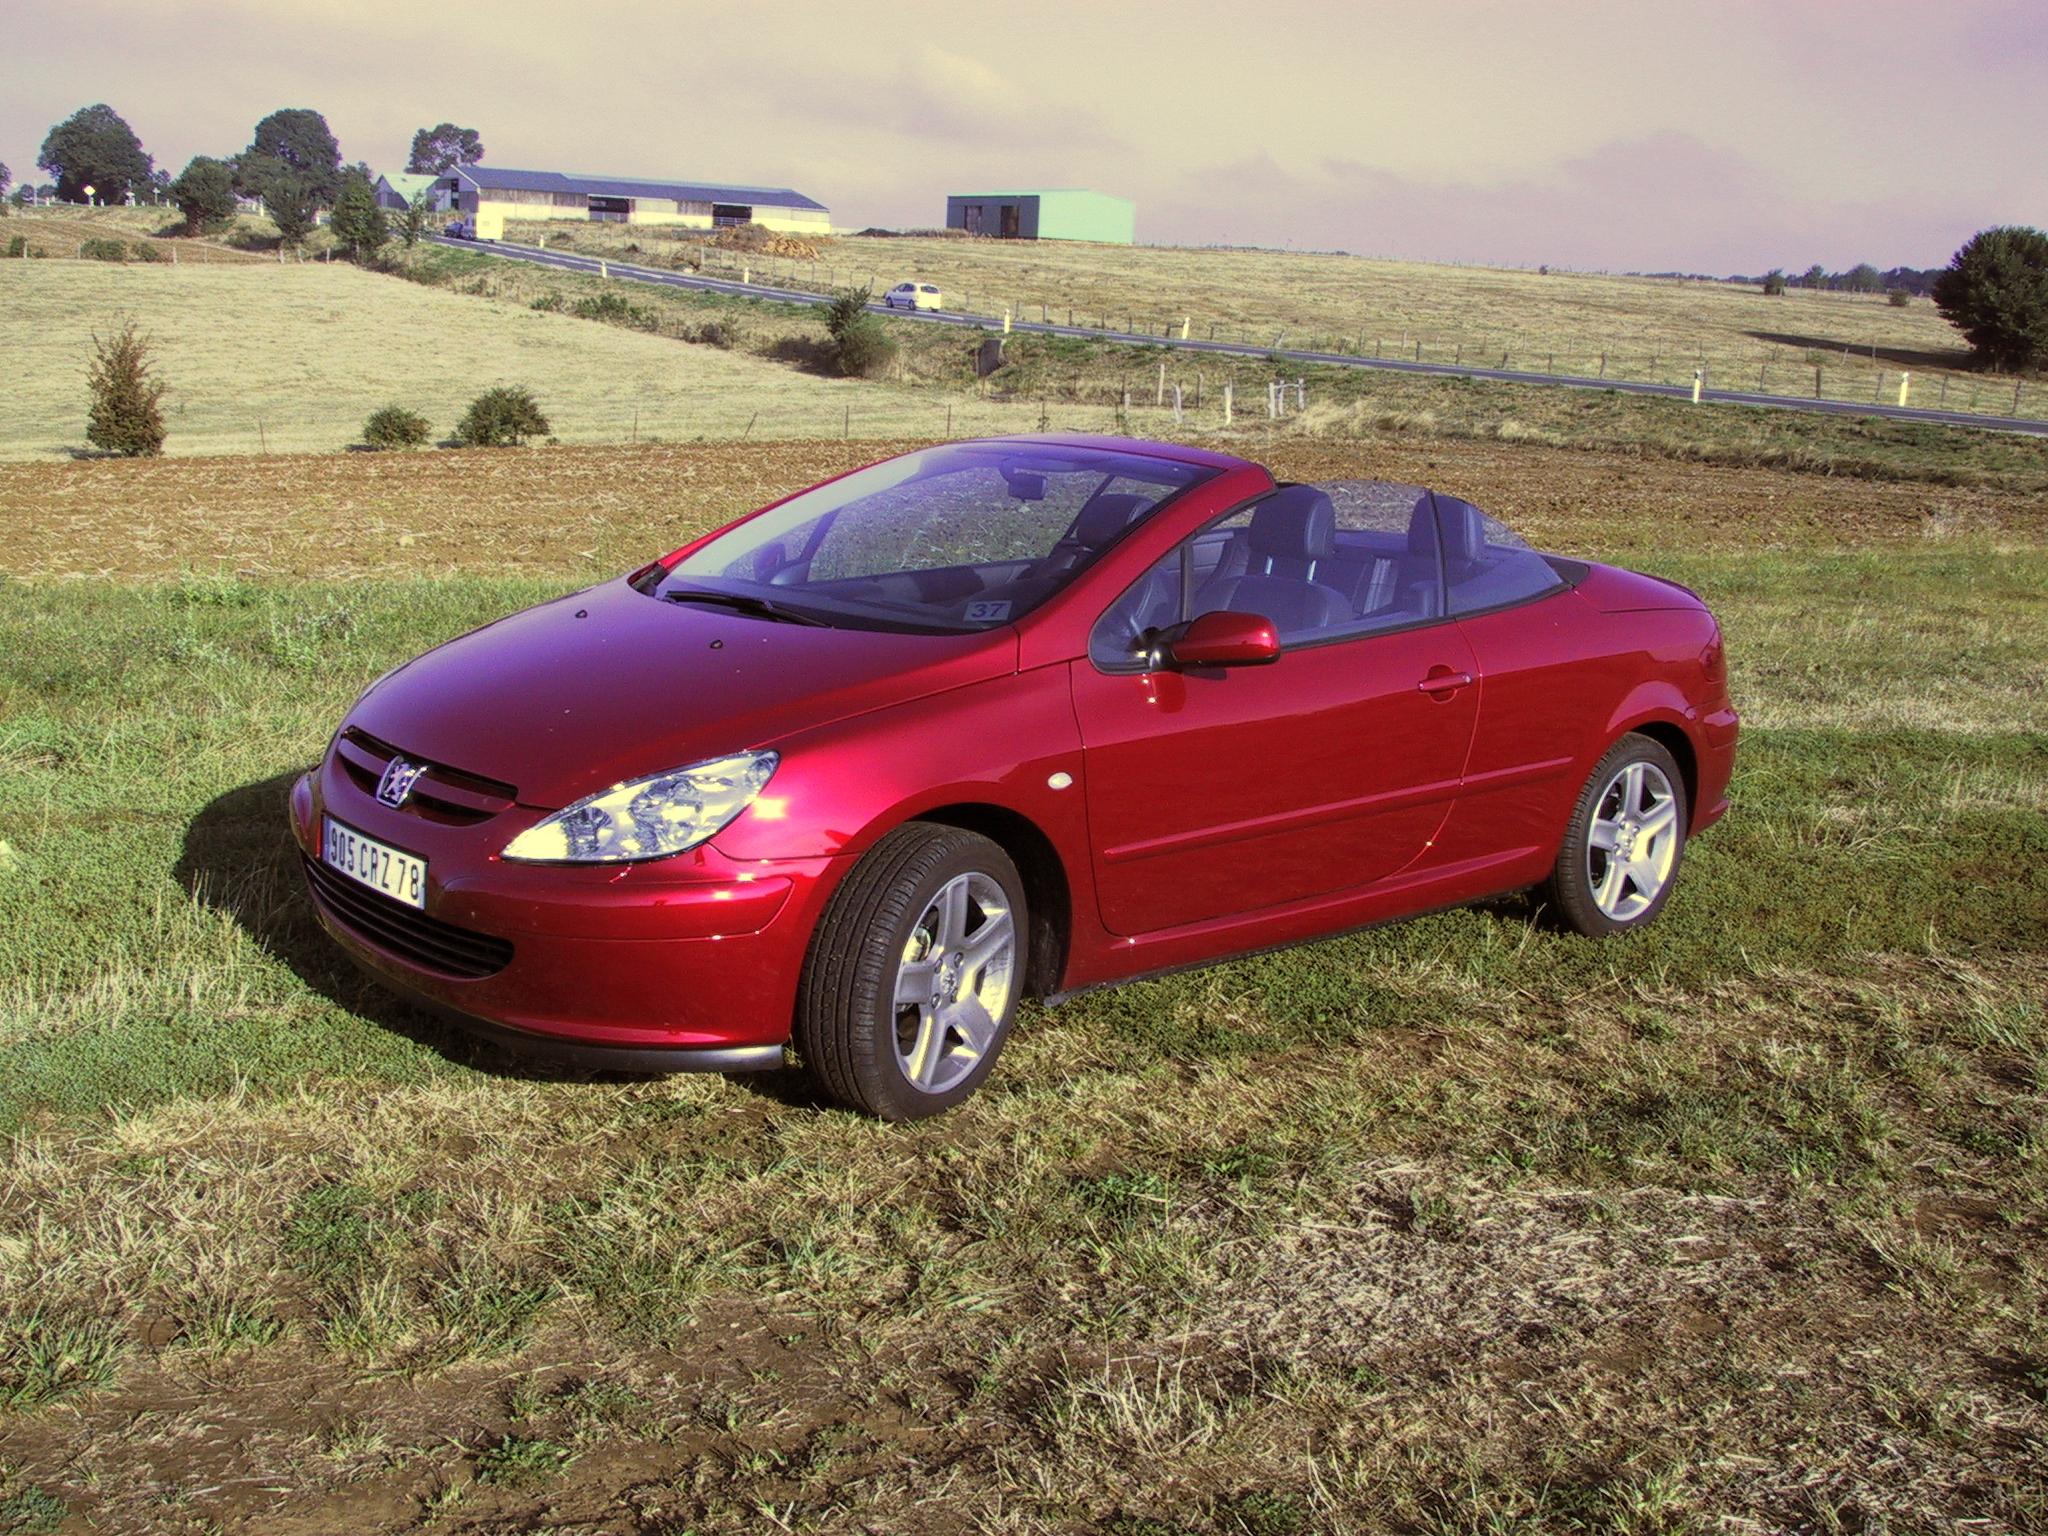 File:Peugeot-307cc.jpg - Wikimedia Commons